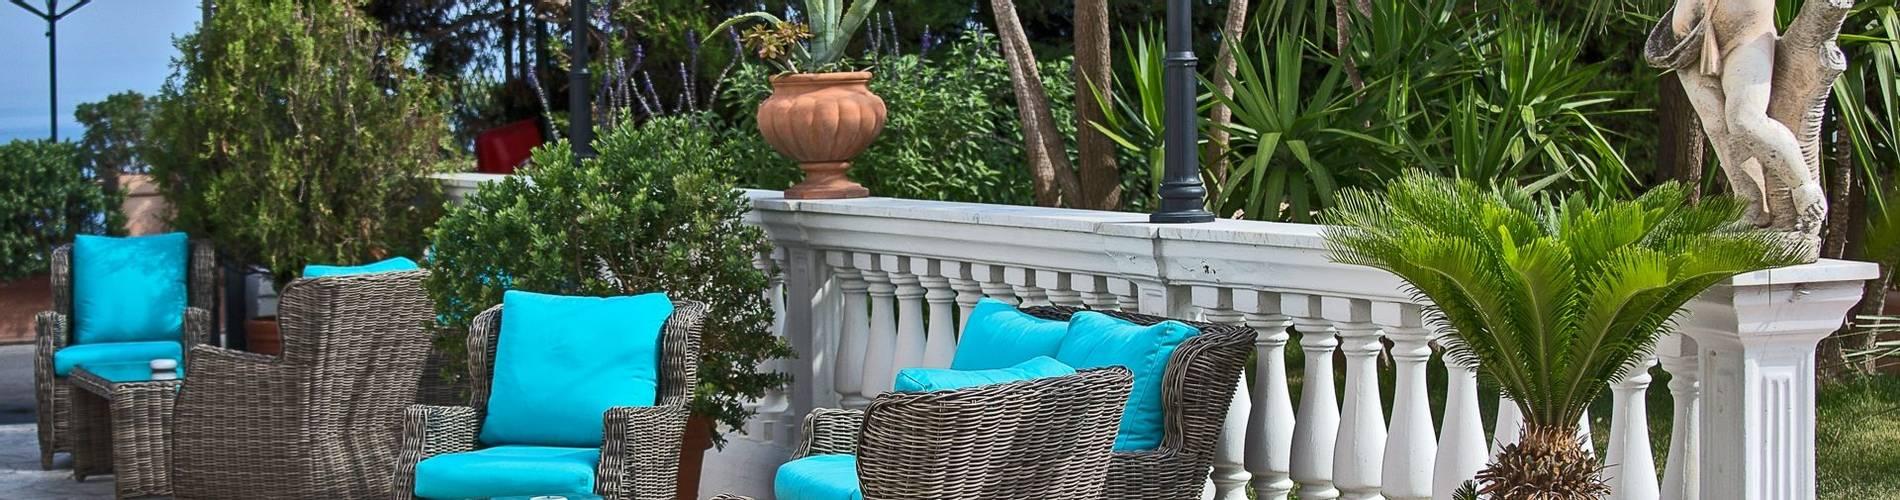 Villa Garden, Amalfi, Italy (21).jpg